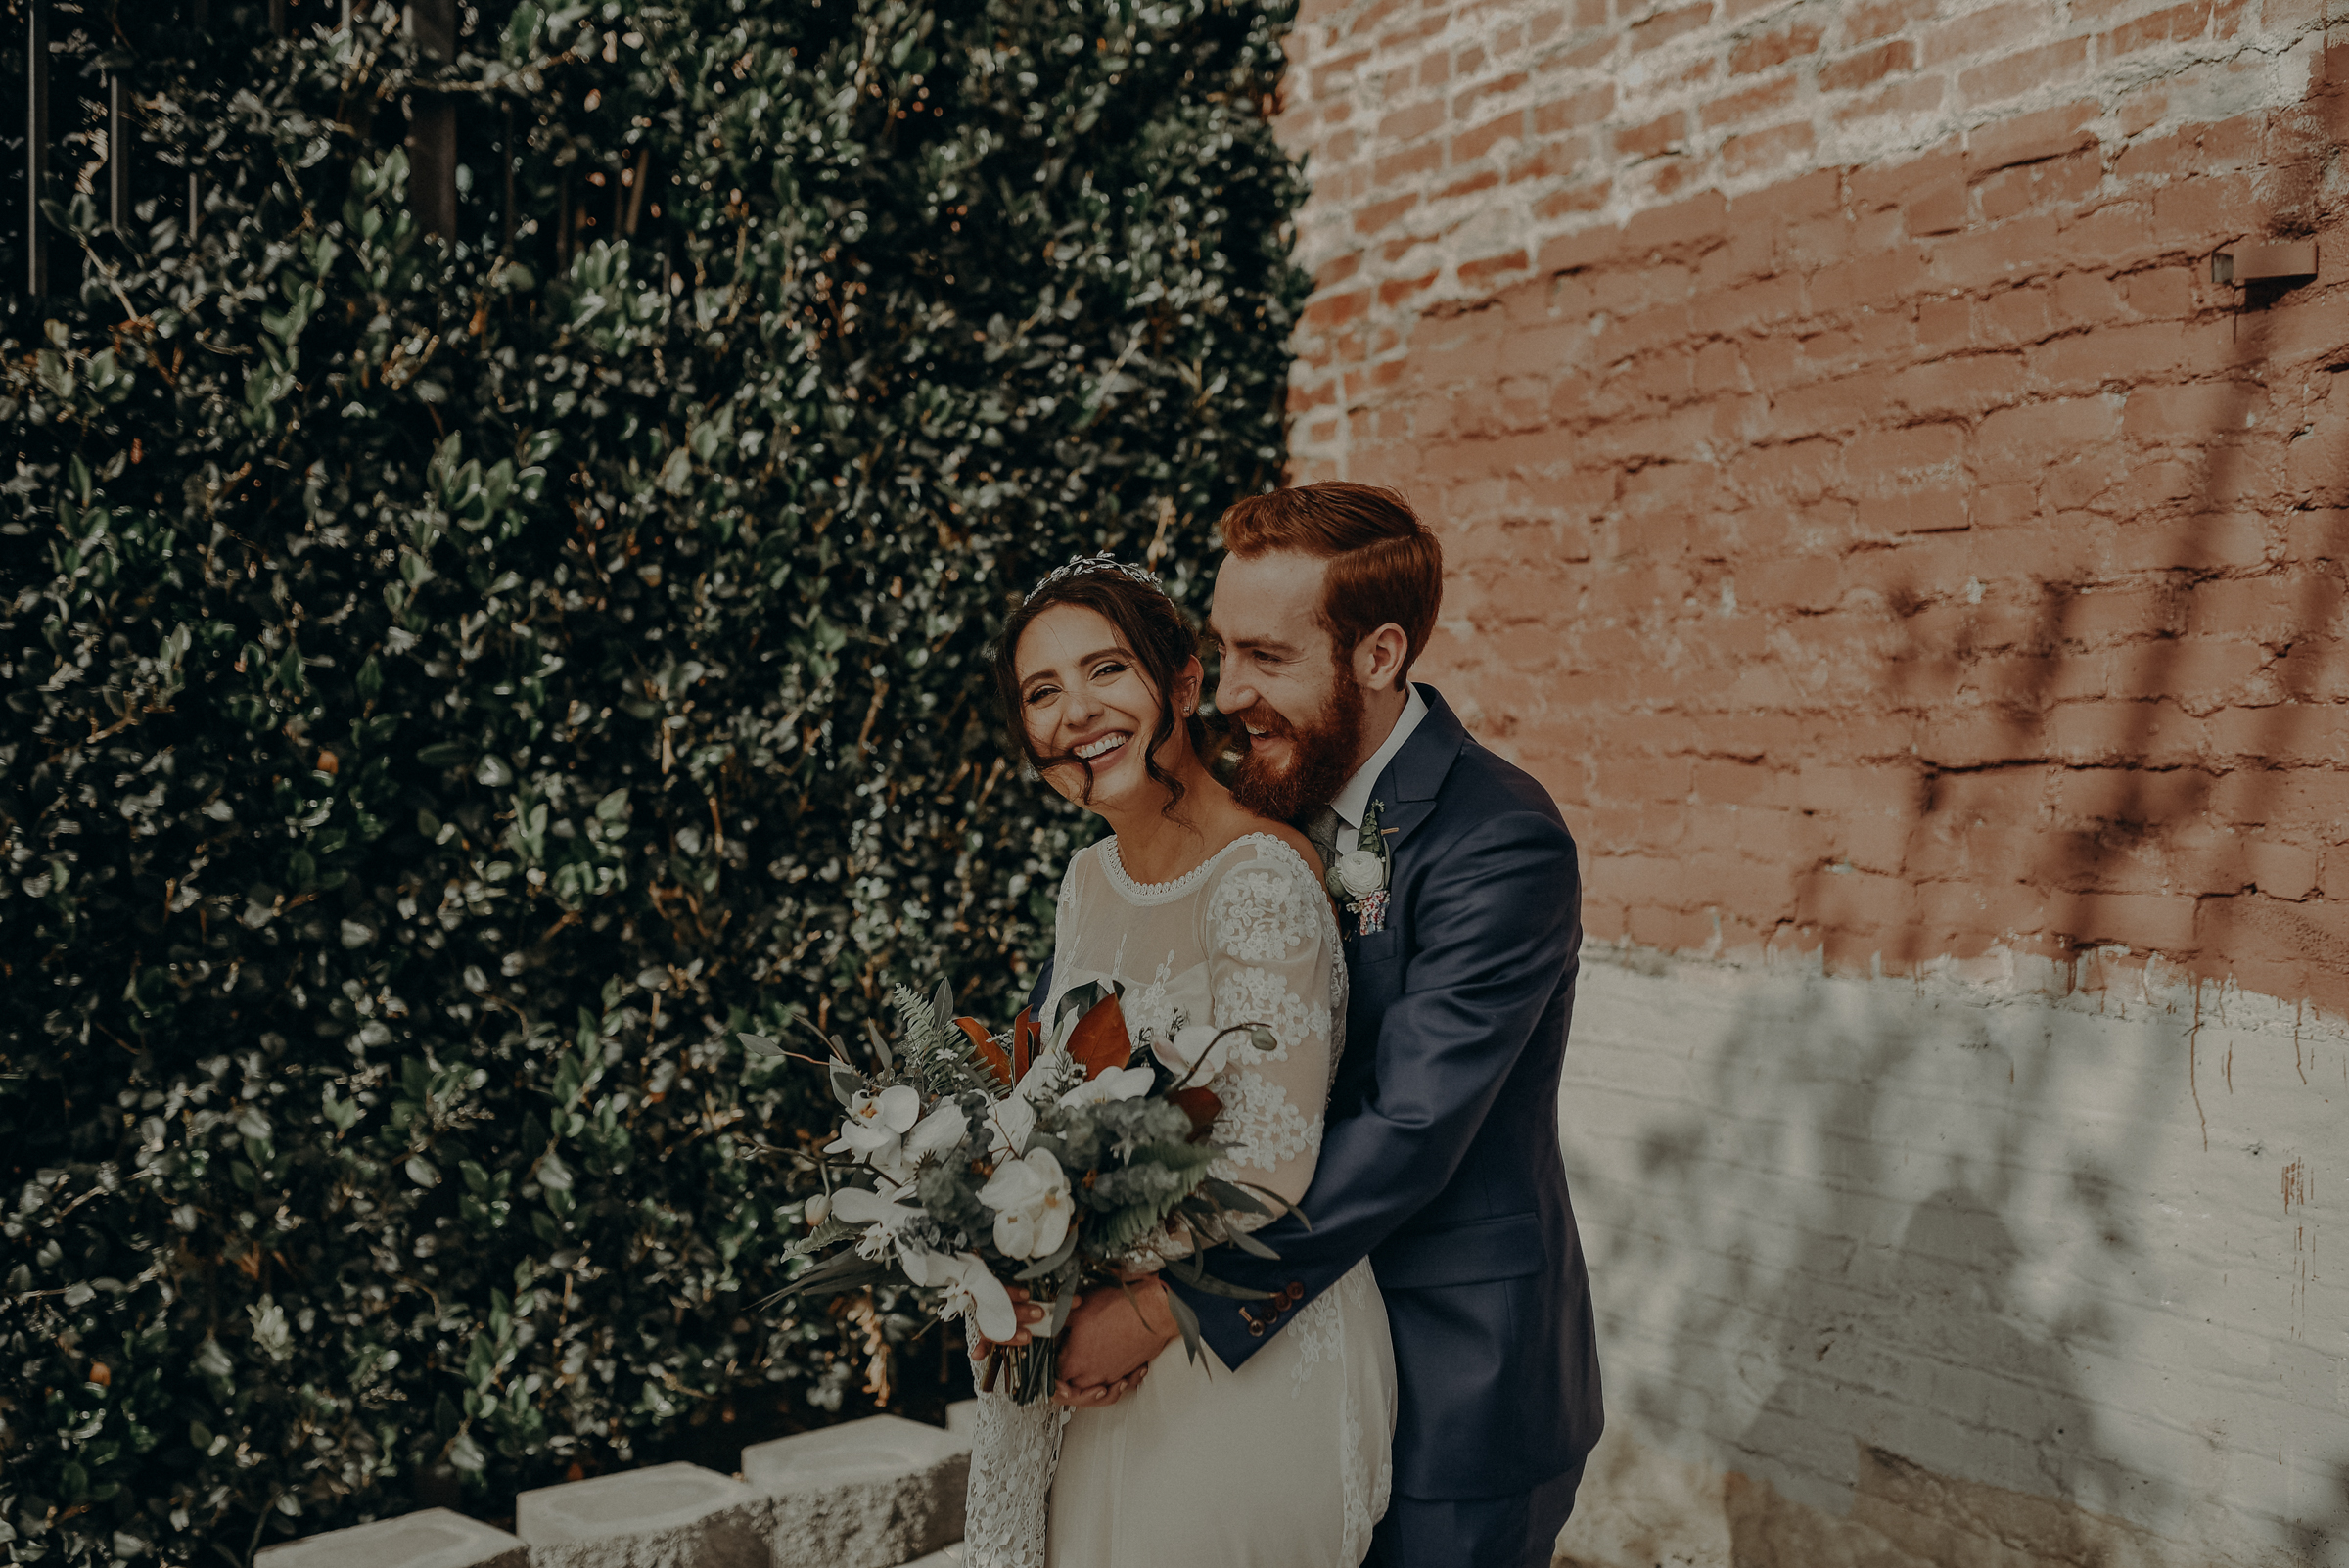 Isaiah + Taylor Photography - Los Angeles Wedding Photographers - The Unique Space Venue-015.jpg